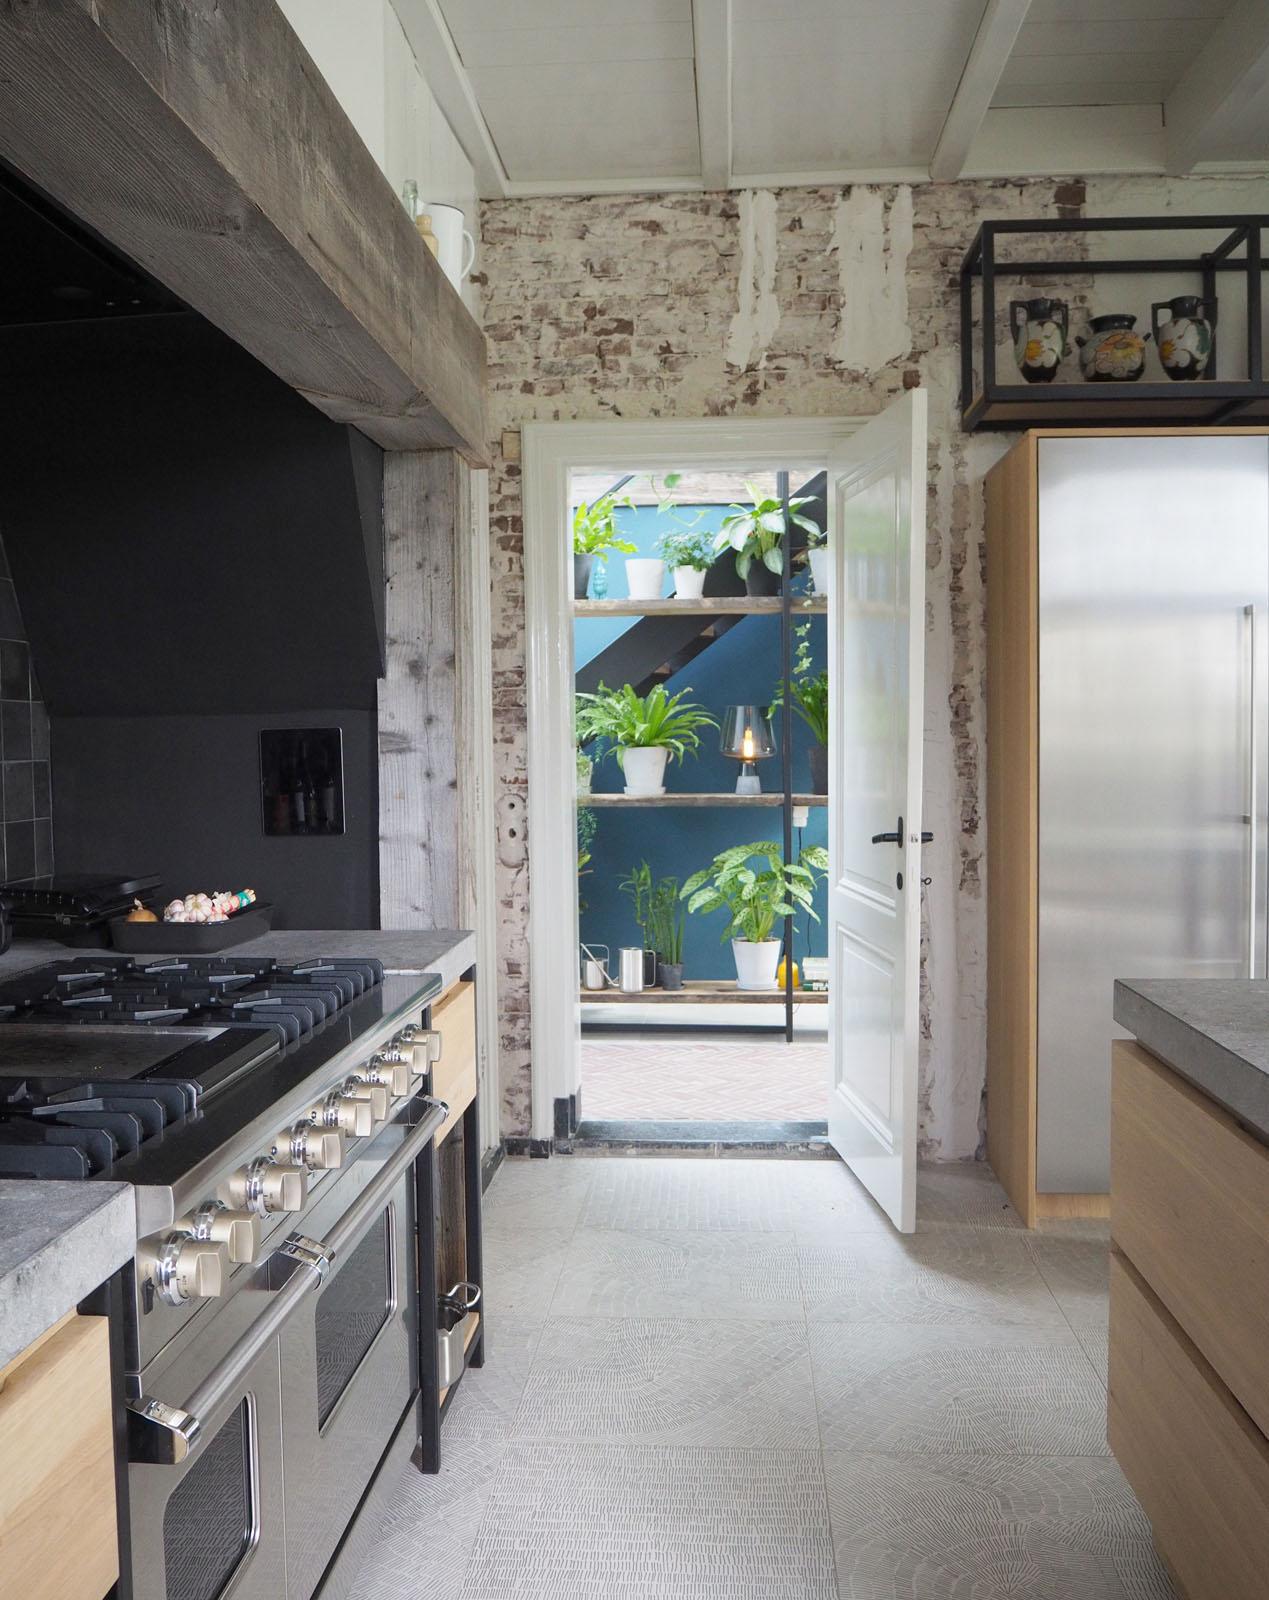 kitchen_cooking_hallway_view_design_jeroendenijs